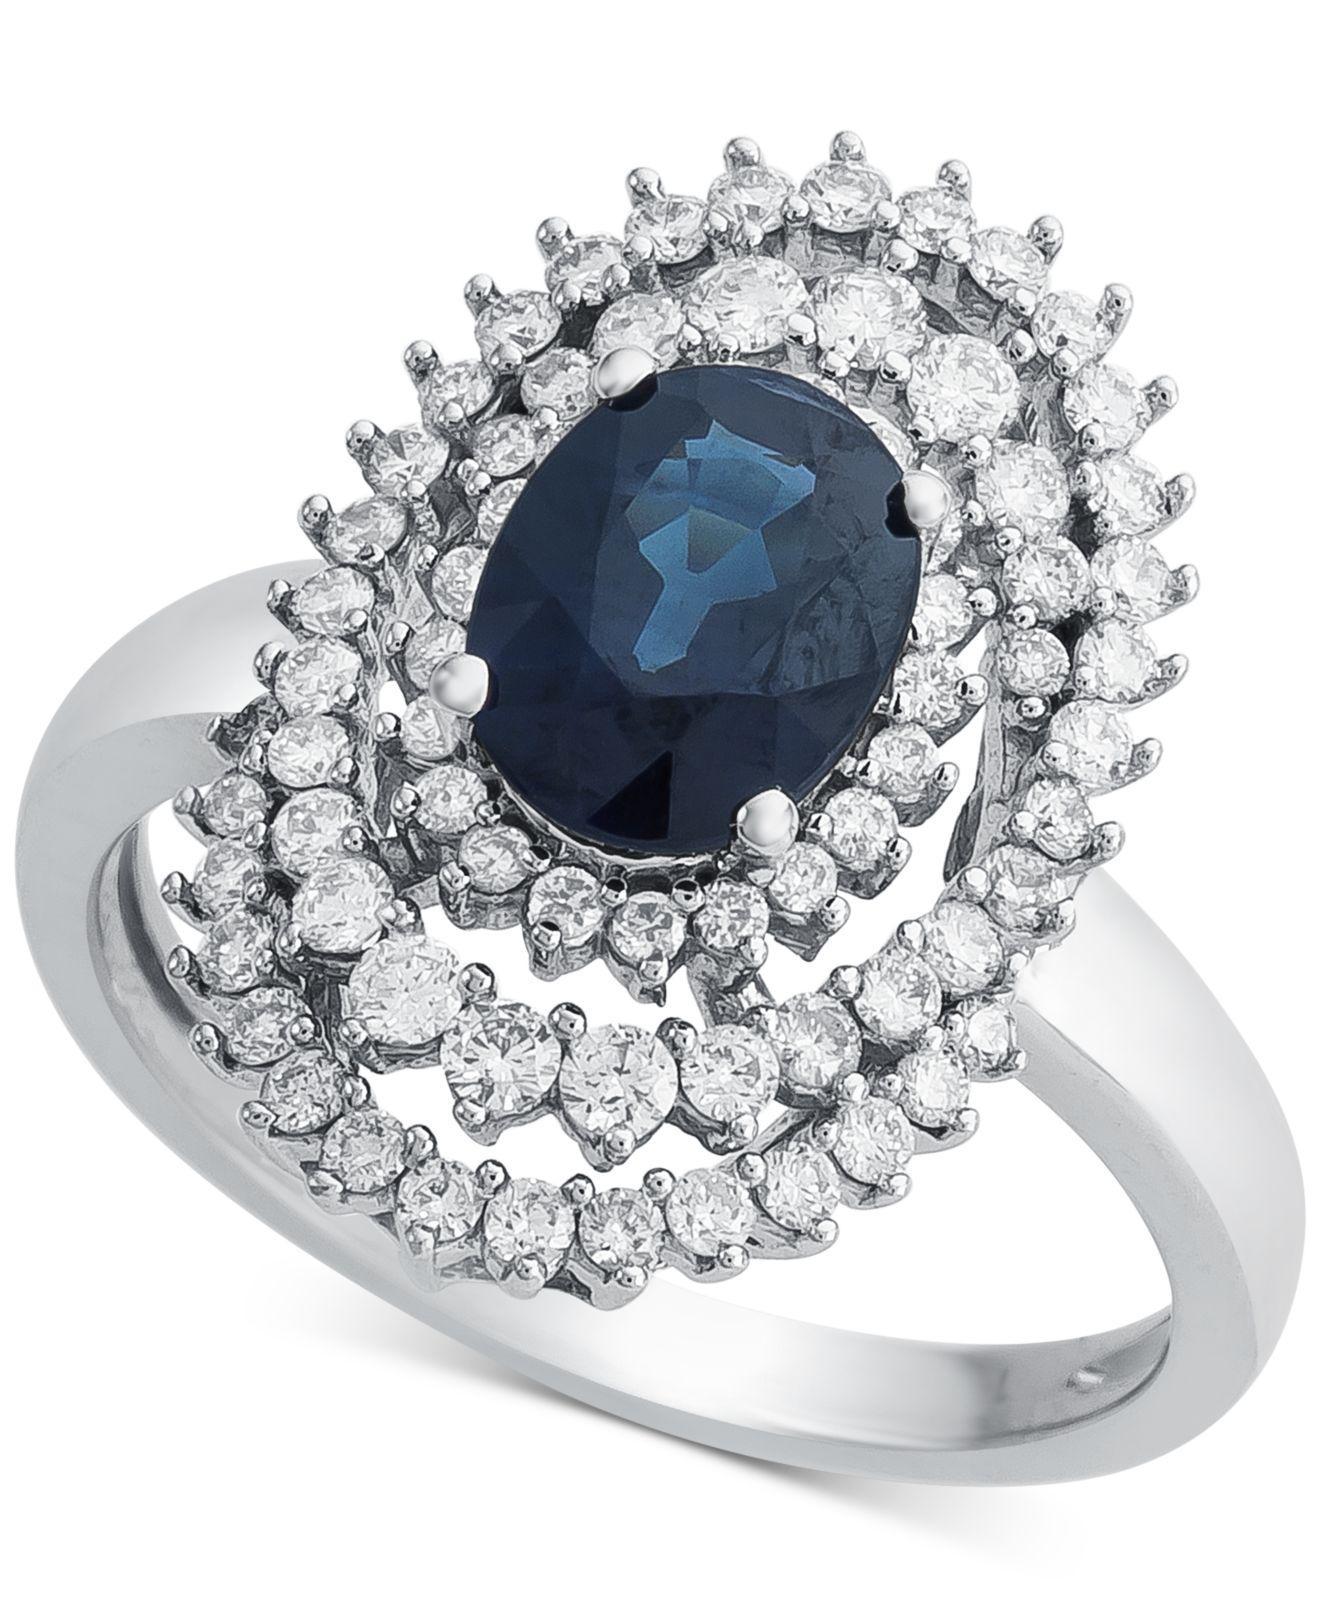 4bbe7dd14 Lyst - Macy's Sapphire (1-1/3 Ct. T.w.) & Diamond (3/4 Ct. T.w. ...